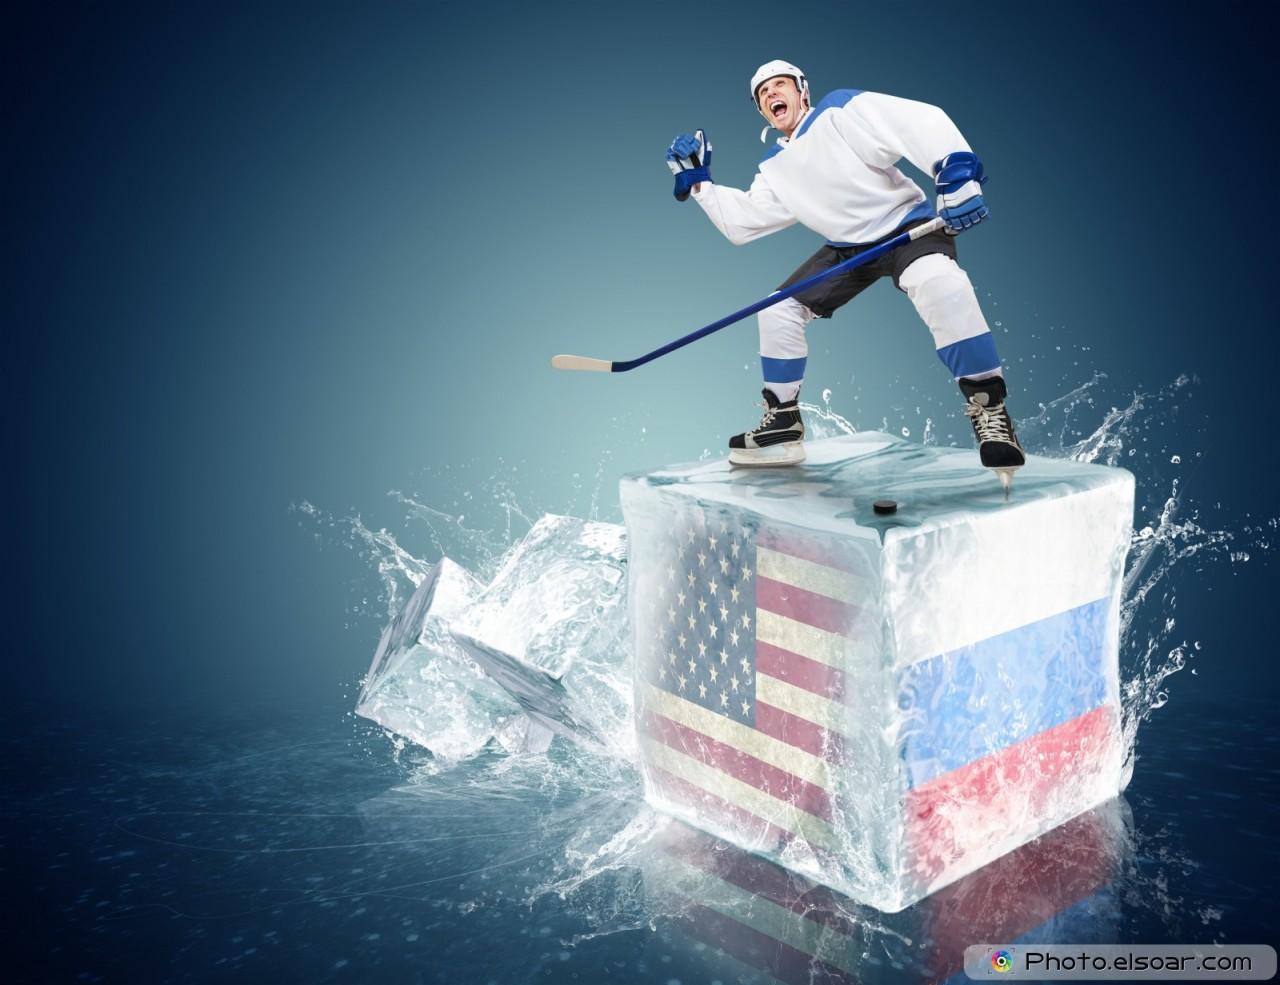 USA - Russia game. Spunky hockey player